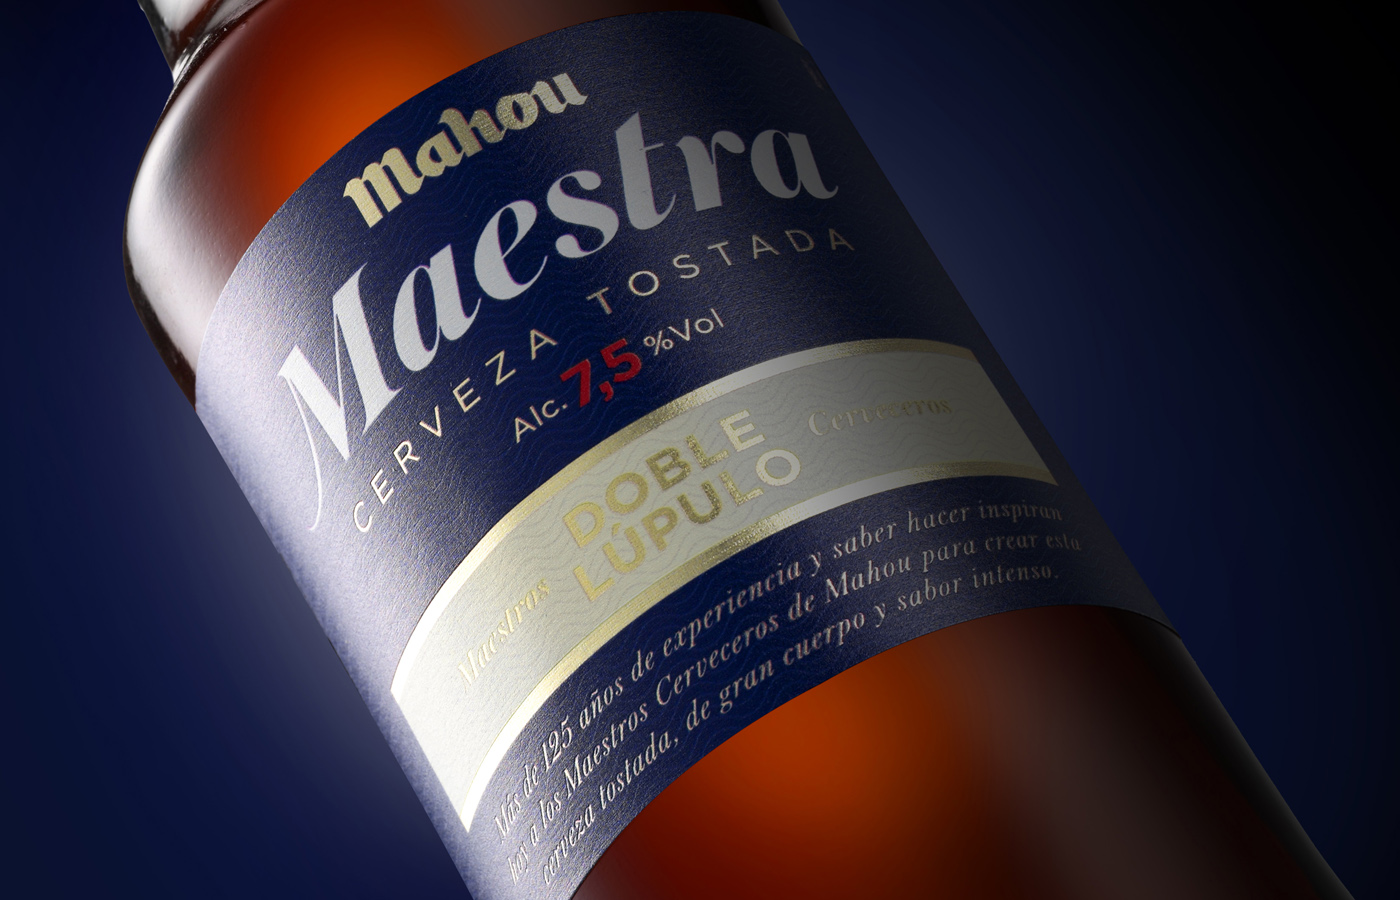 Mahou presenta Maestra, nueva cerveza tostada de doble lúpulo